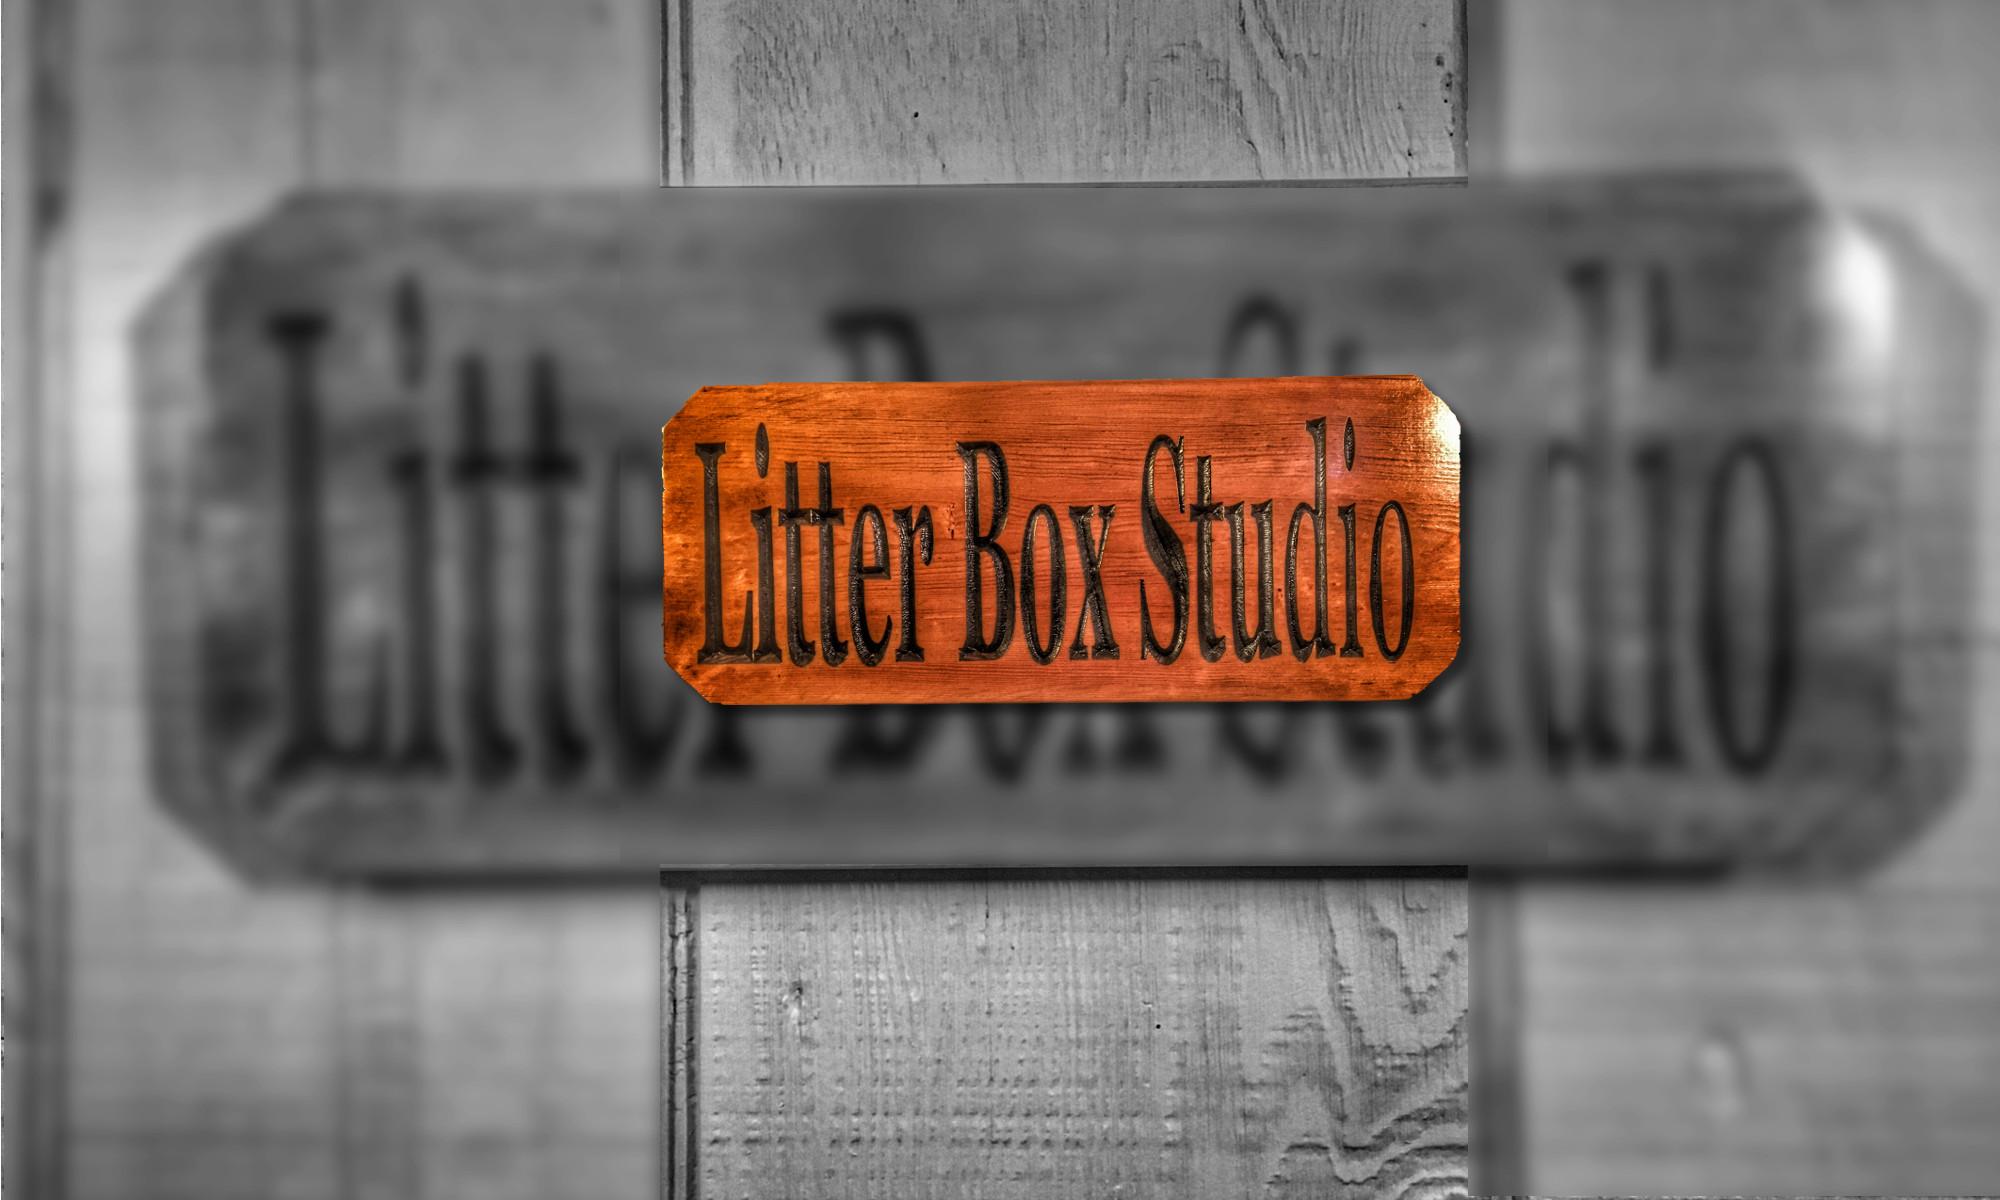 Litter Box Studio